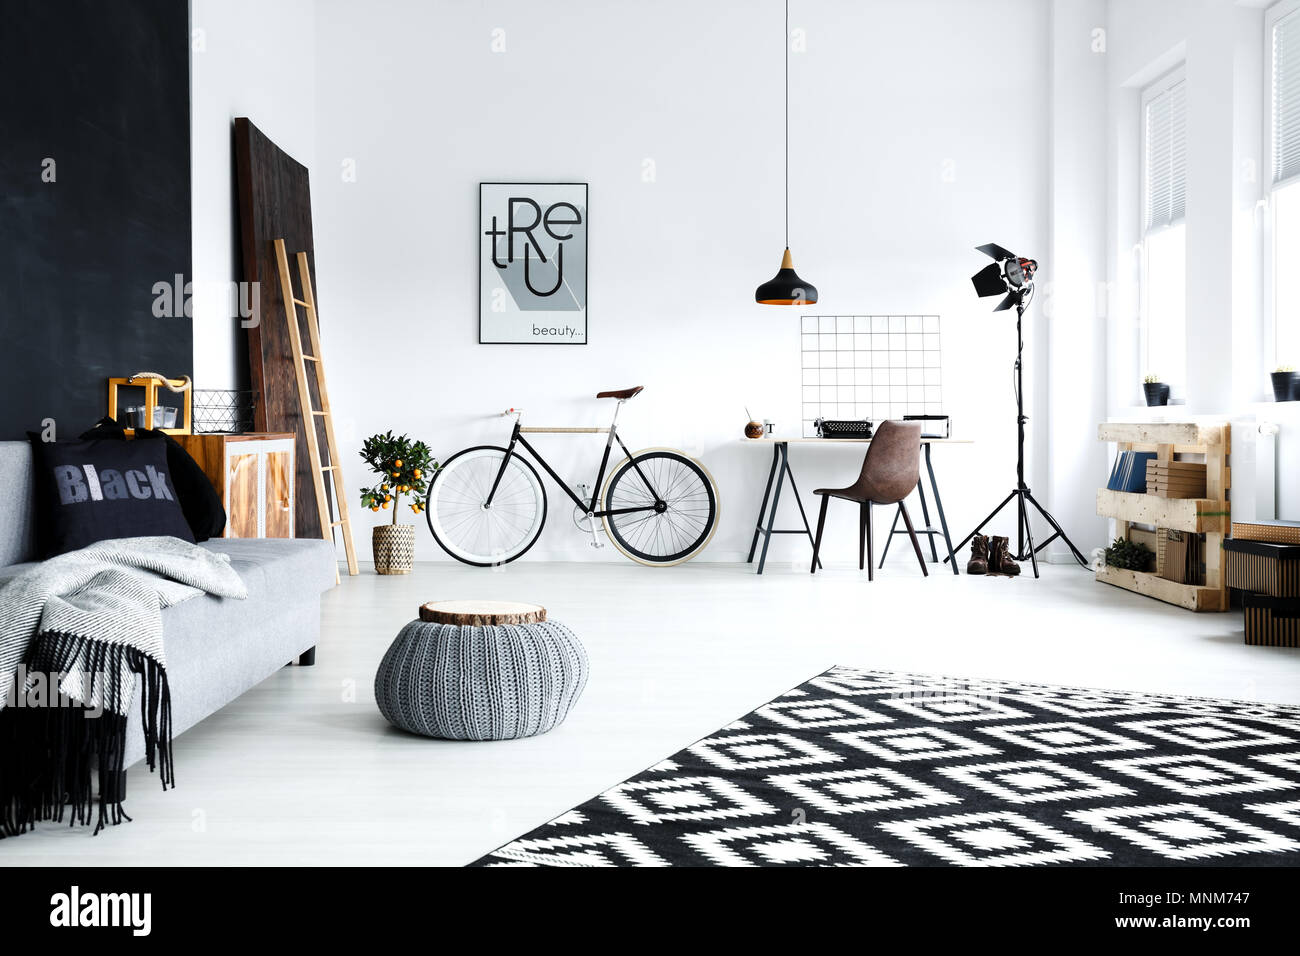 Plan abierto, blanco estudio con sofá, bicicleta, pouf, escritorio Imagen De Stock